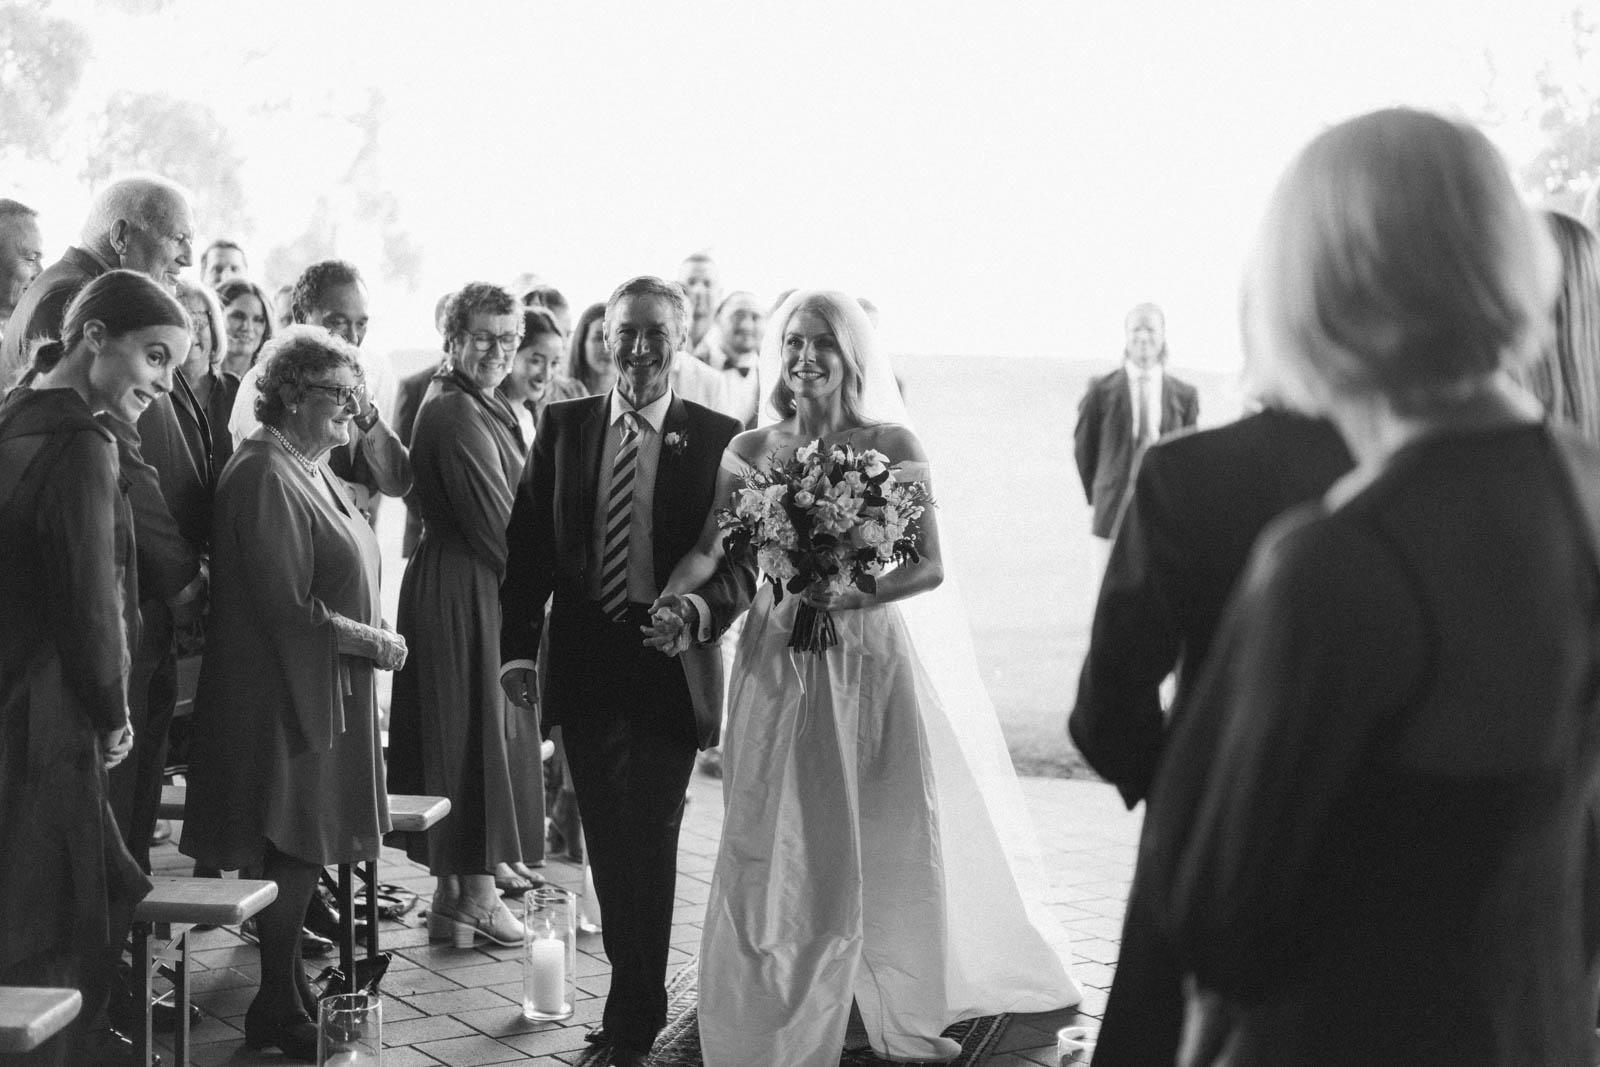 newfound-s-p-mt-maunganui-tauranga-wedding-photographer-1655-A9_06057